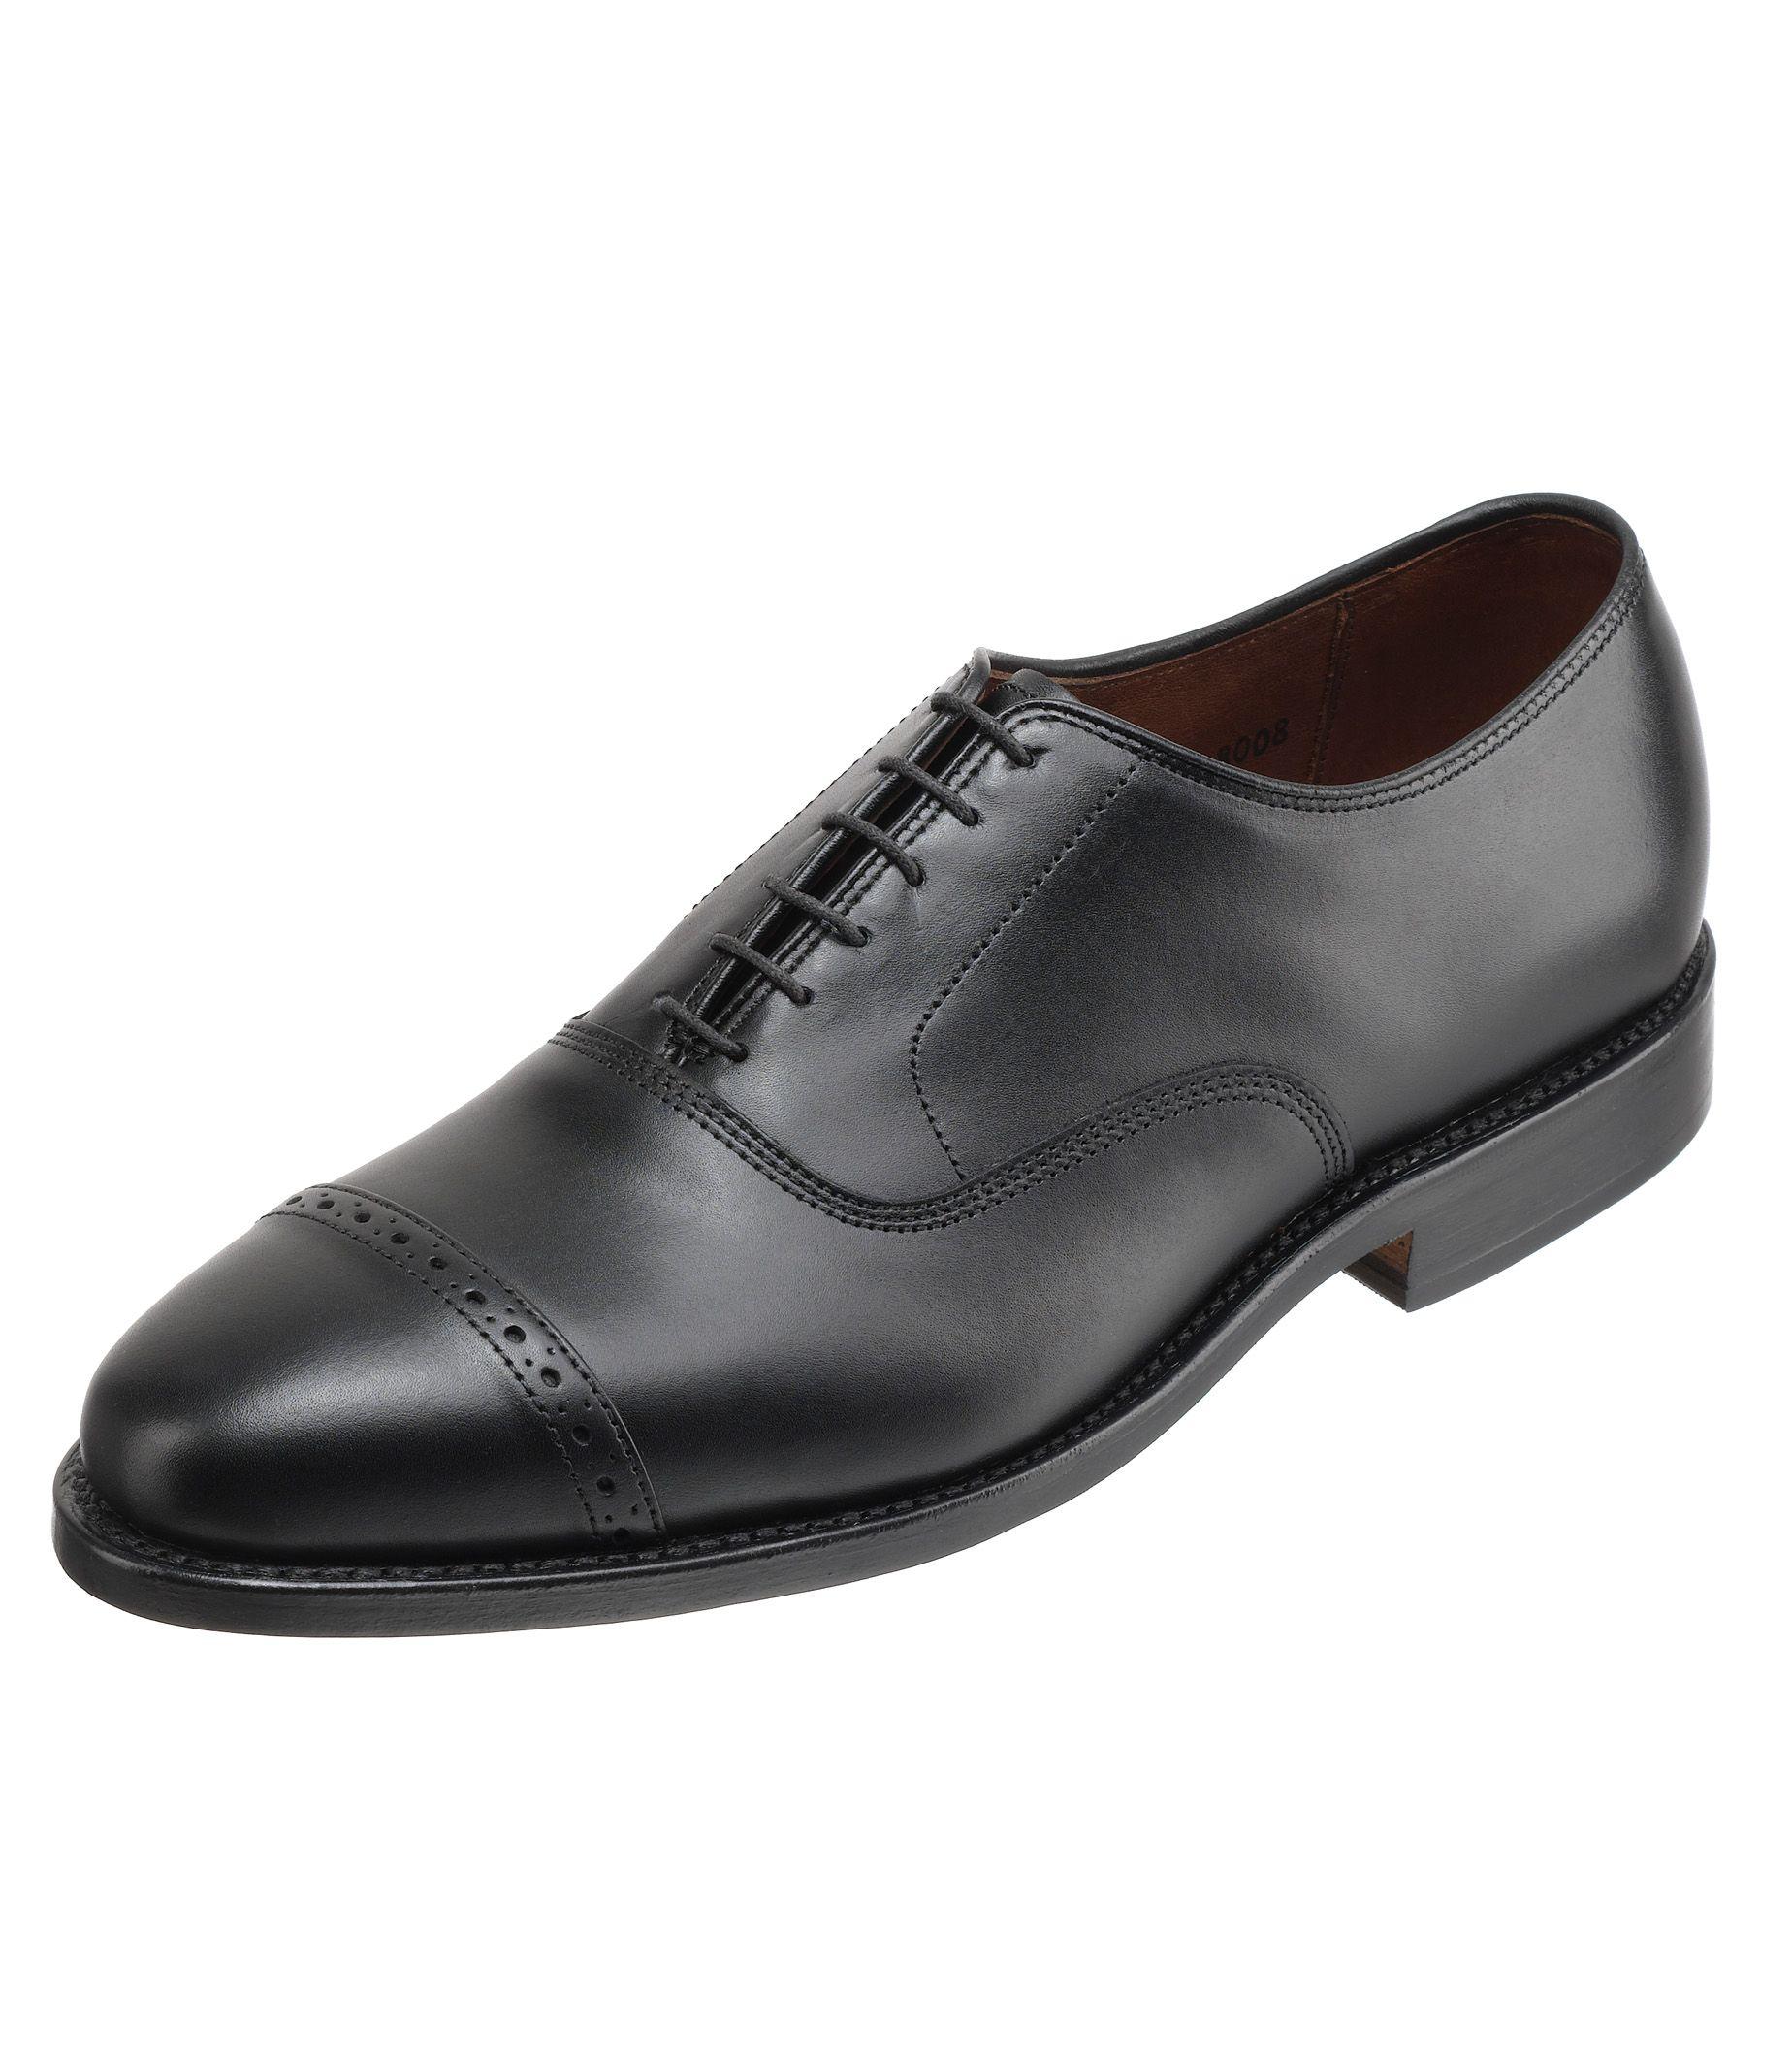 Nathan Shoe by Allen Edmonds